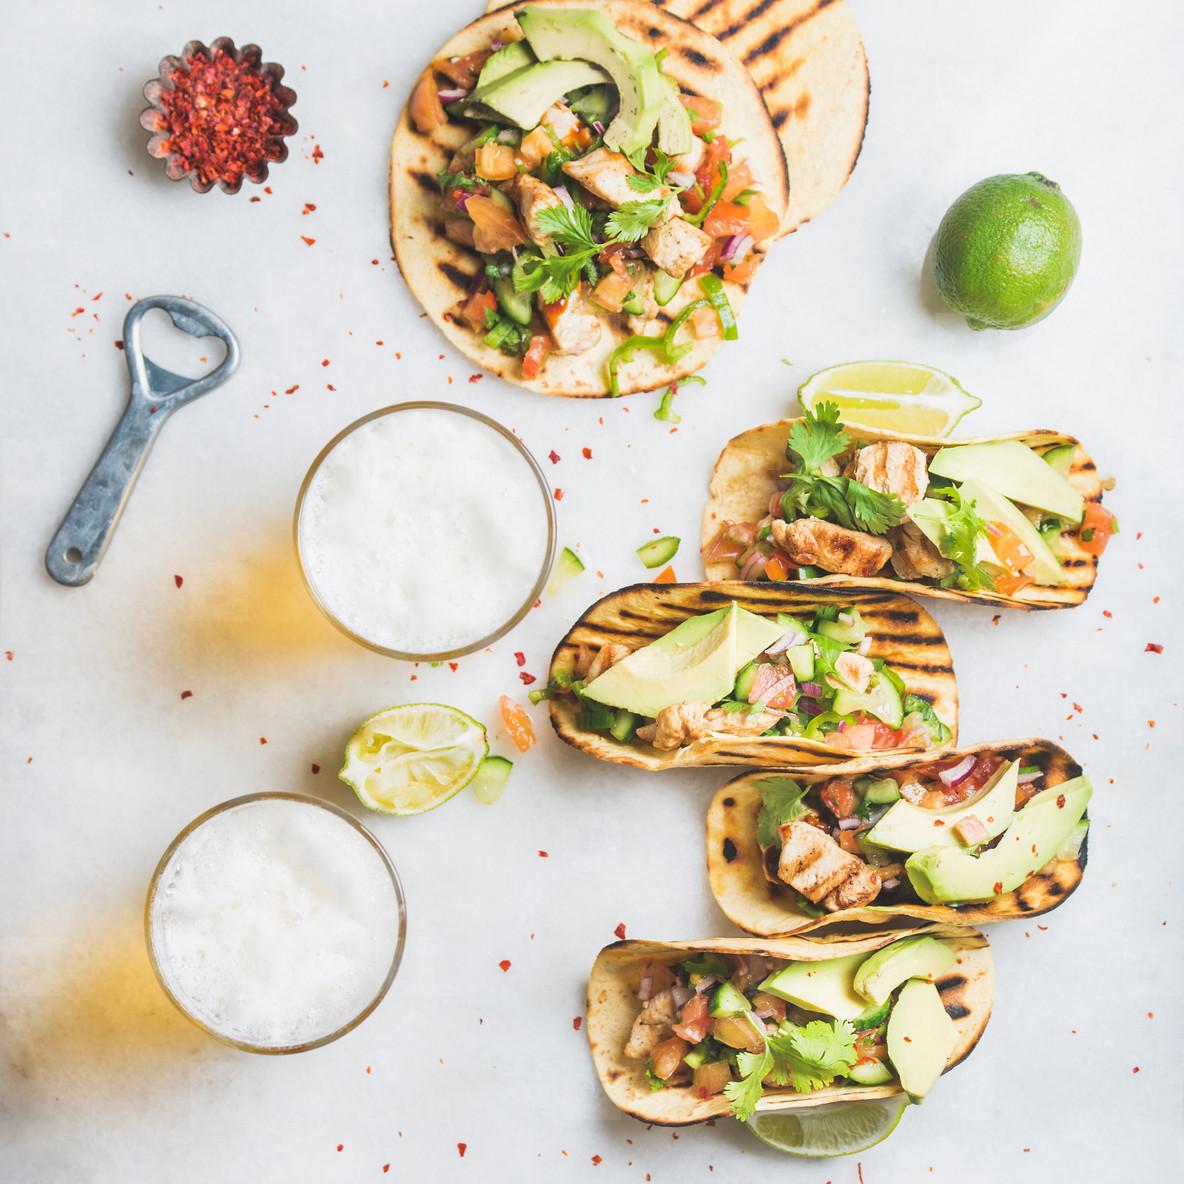 Healthy corn tortillas with chicken  avocado  salsa  limes and beer